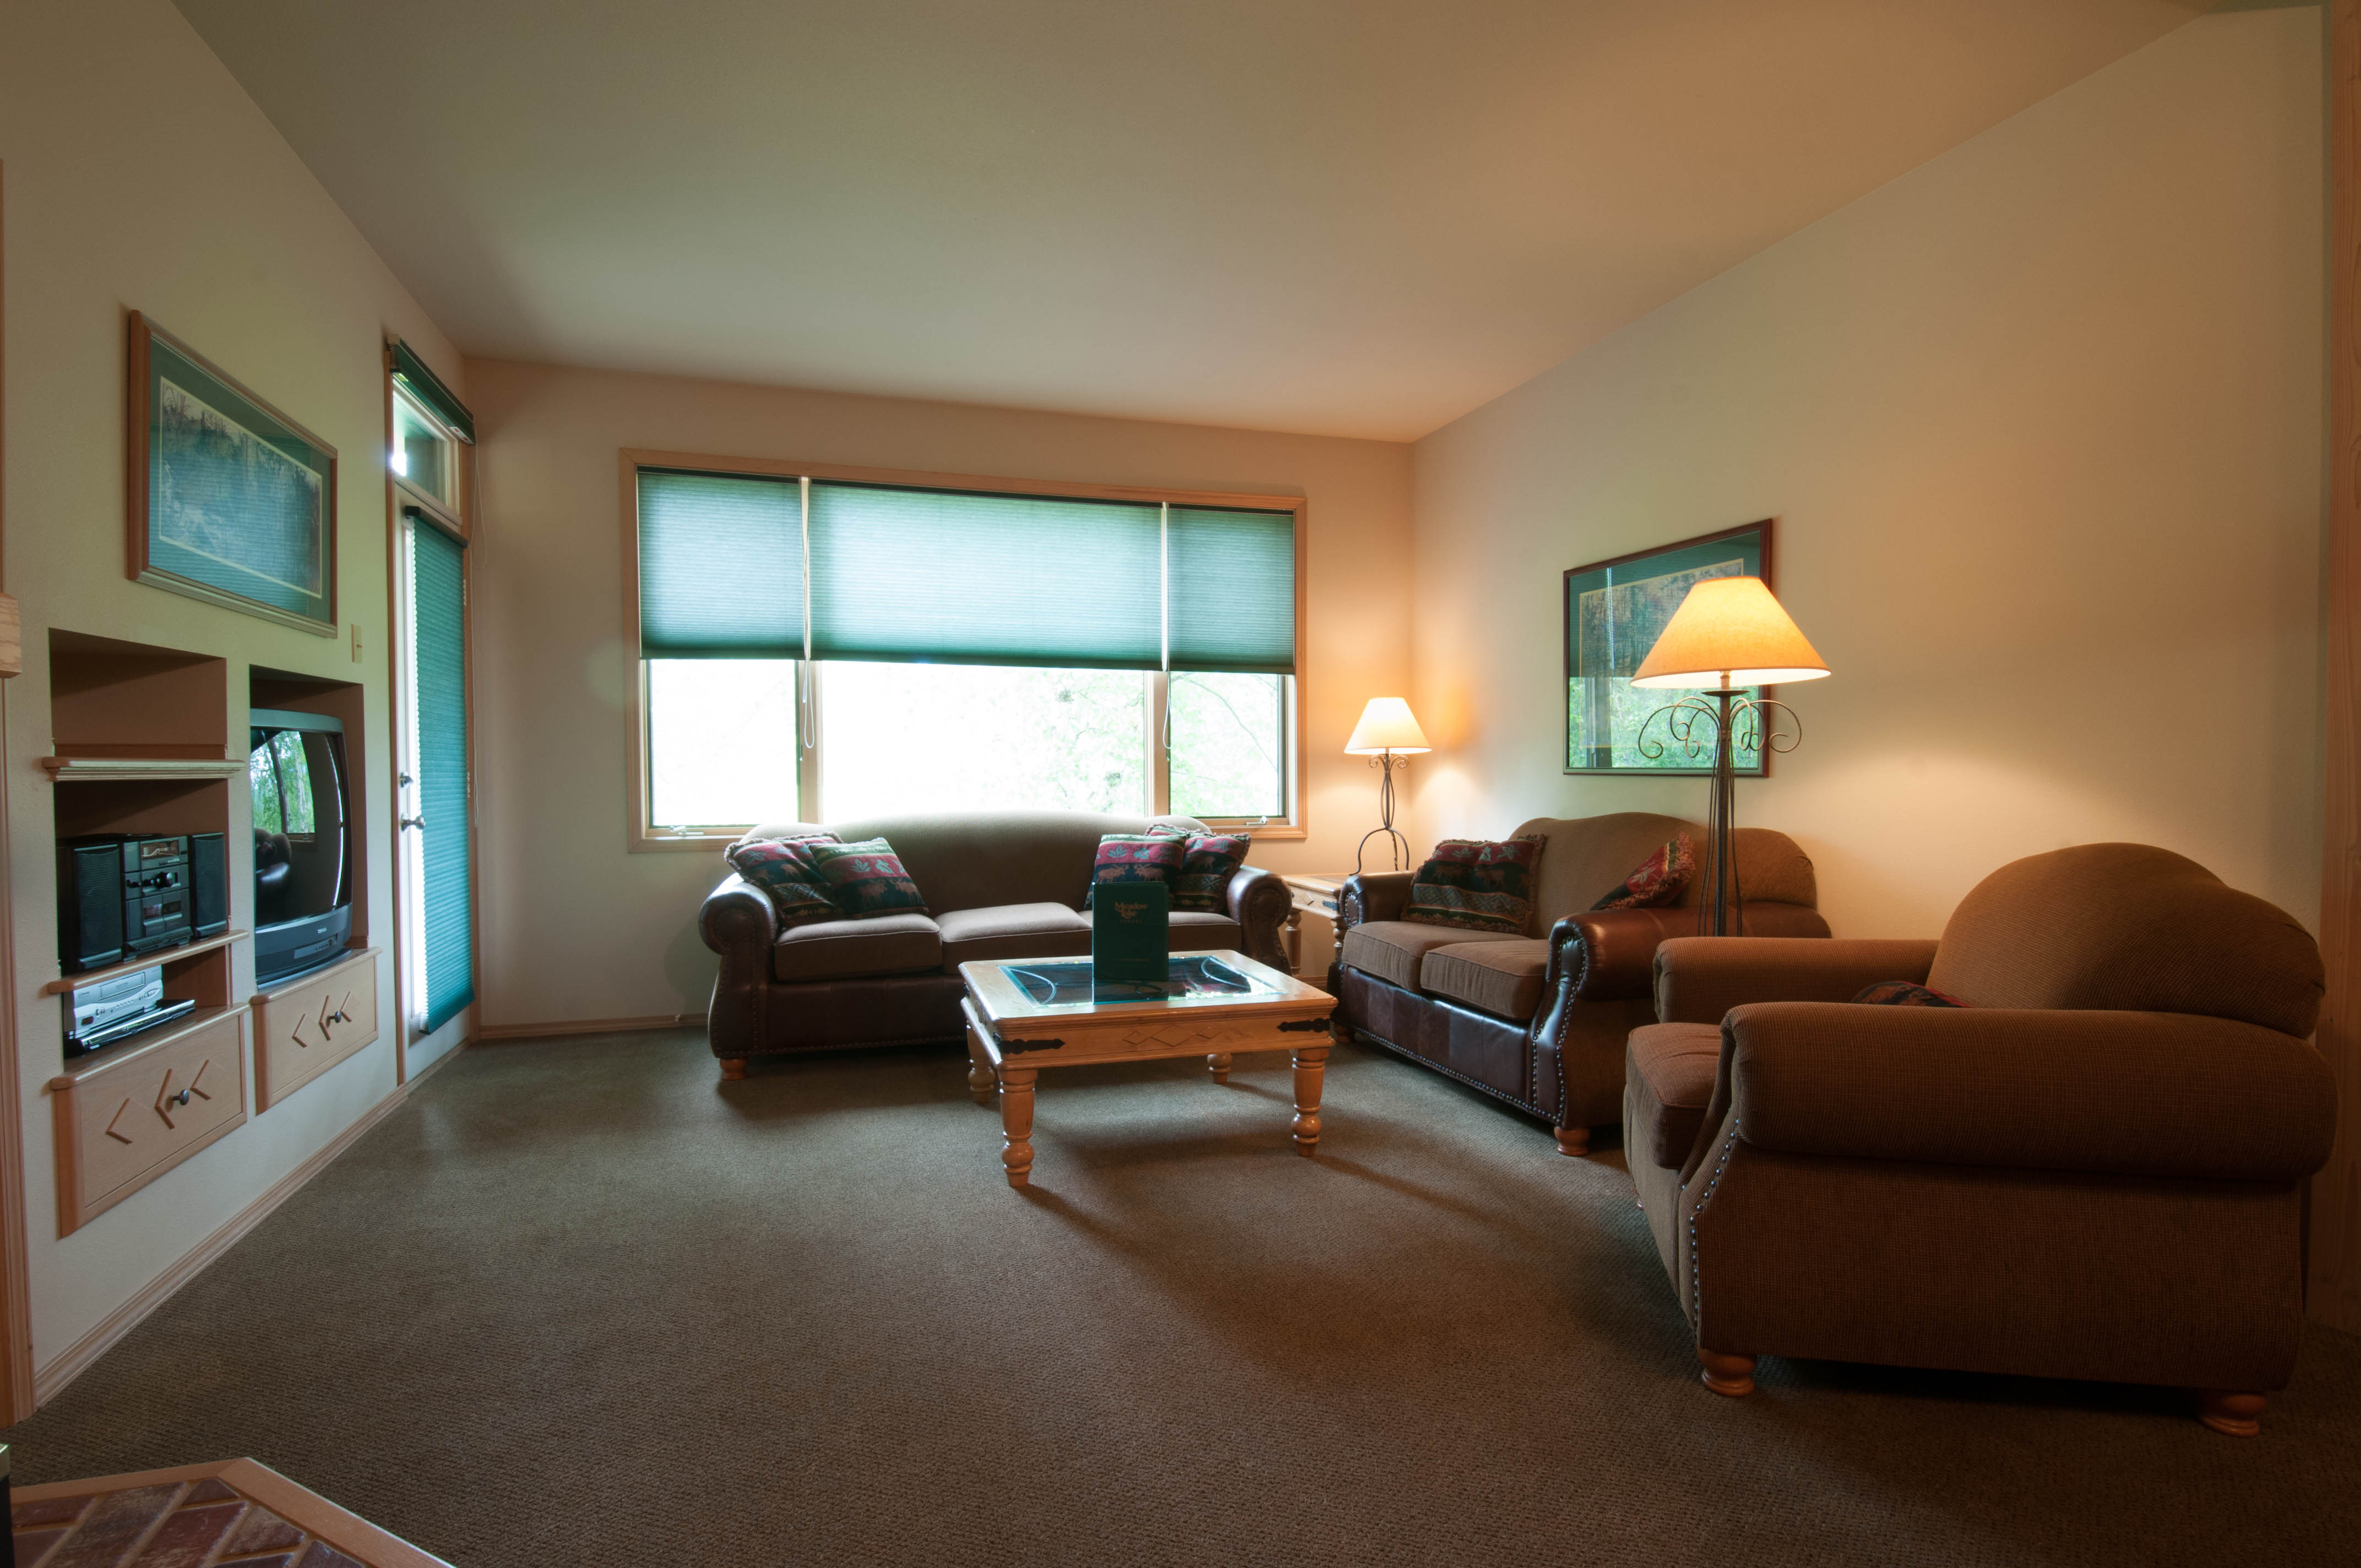 Condo Two Bedroom Living Main Unit